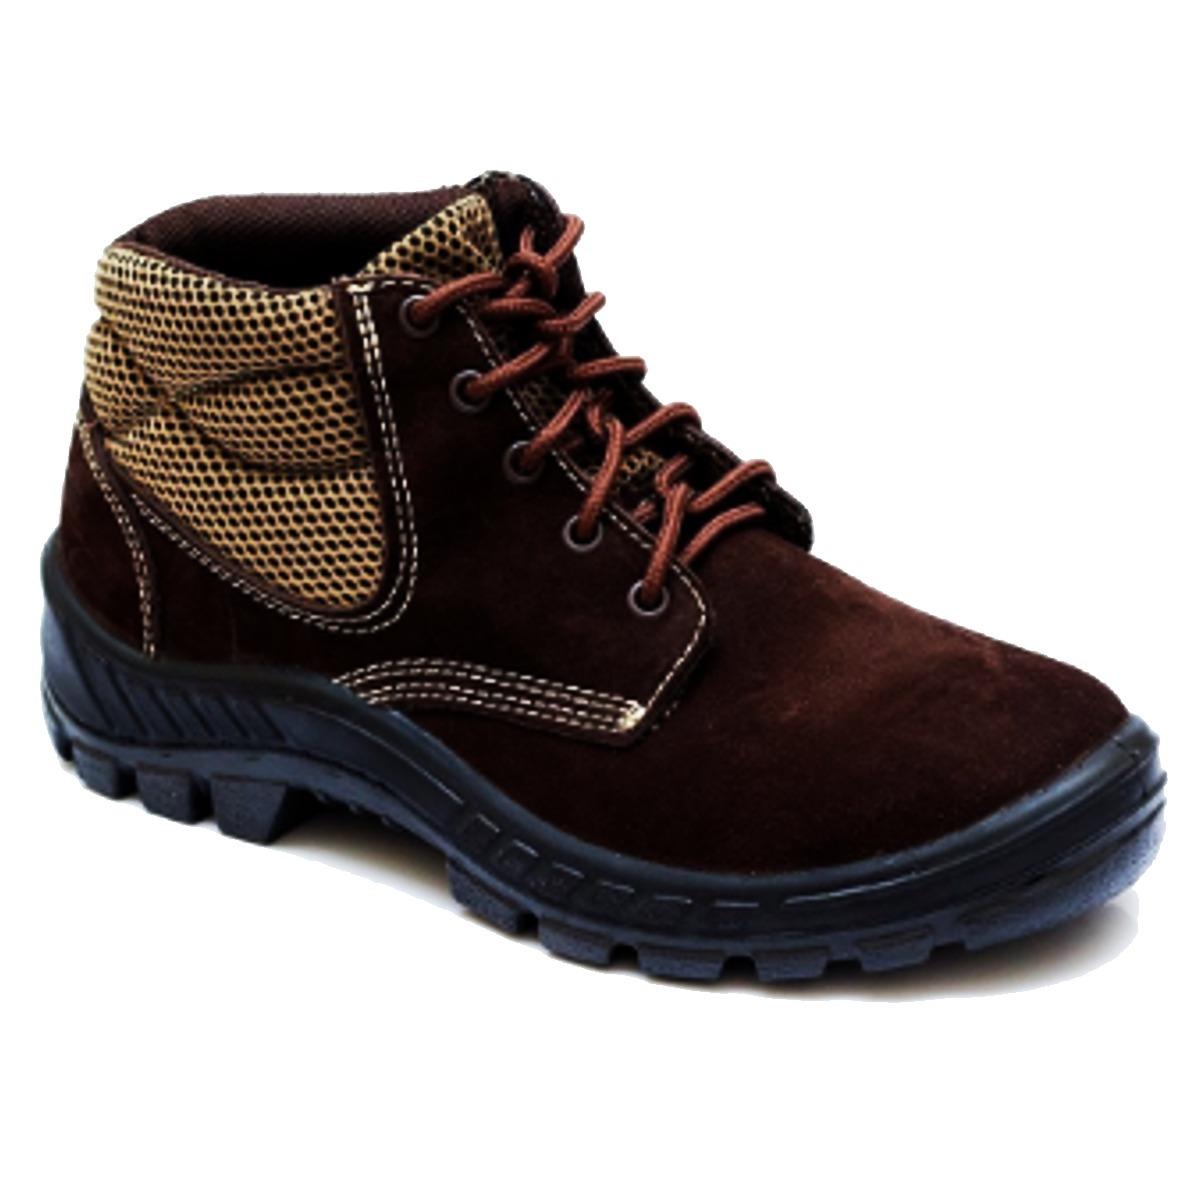 6519529f6 bota trekking bico composite nobuck marrom marluvas. Carregando zoom.